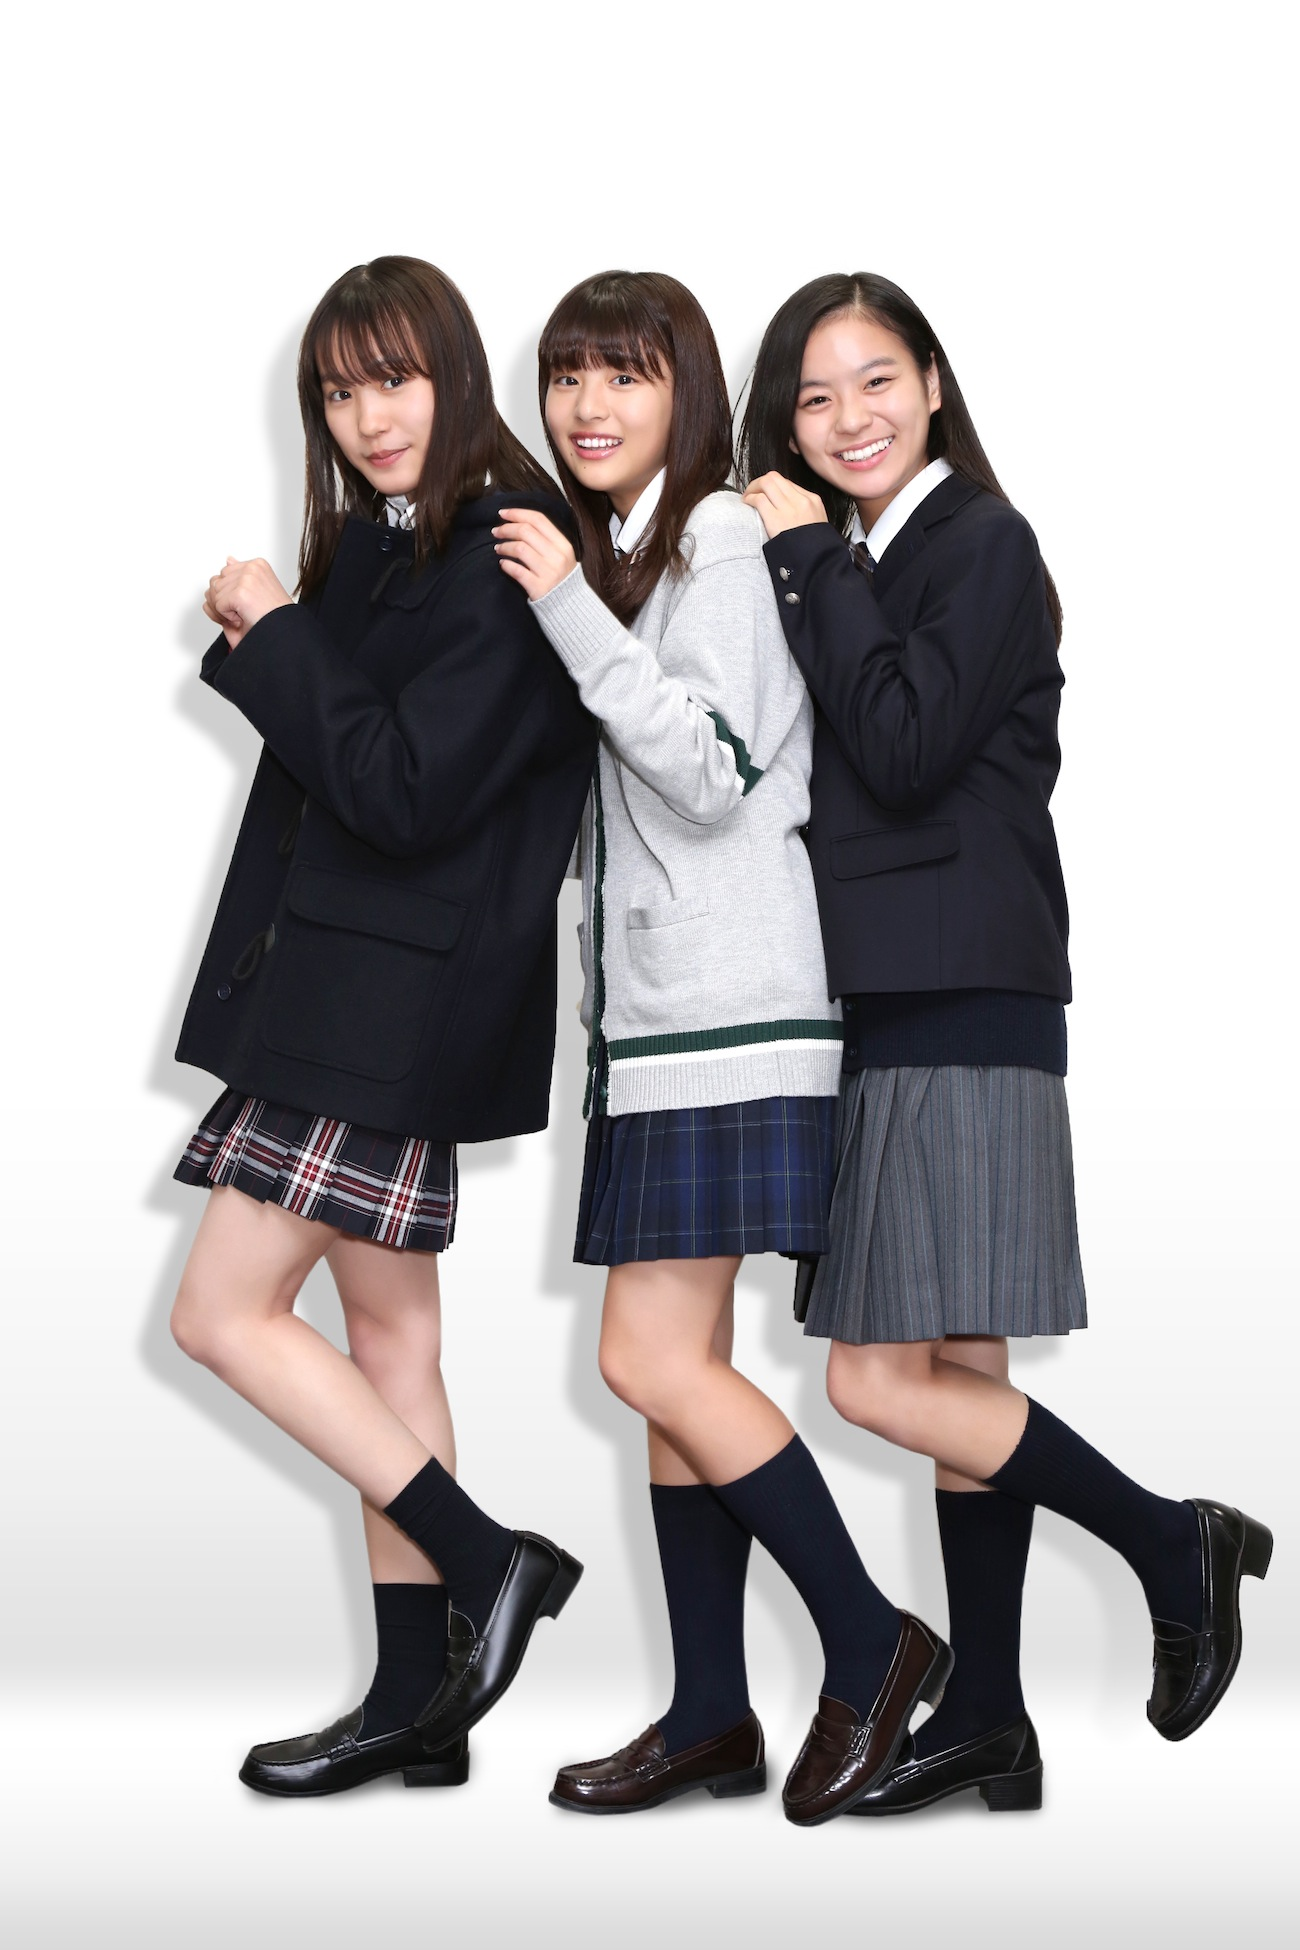 南沙良、出口夏希、永瀬莉子/『ココア』主演